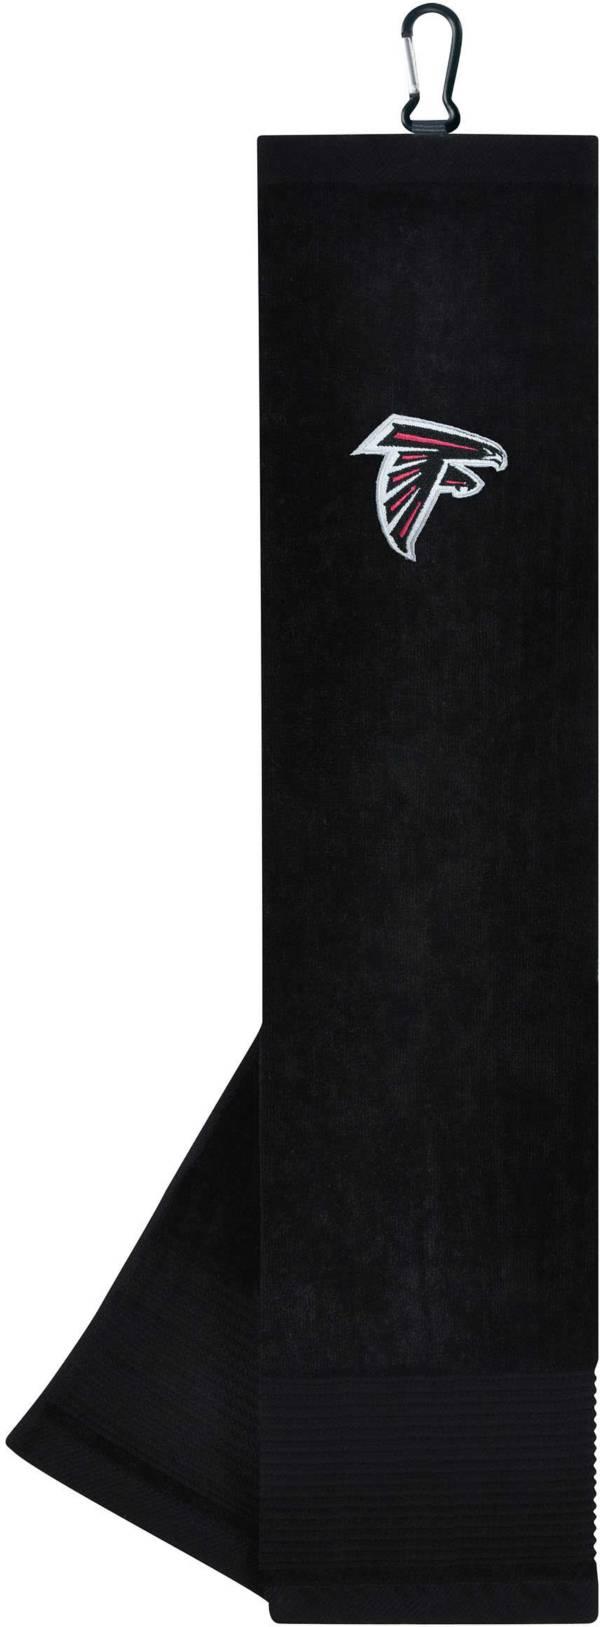 Team Effort Atlanta Falcons Embroidered Face/Club Tri-Fold Towel product image